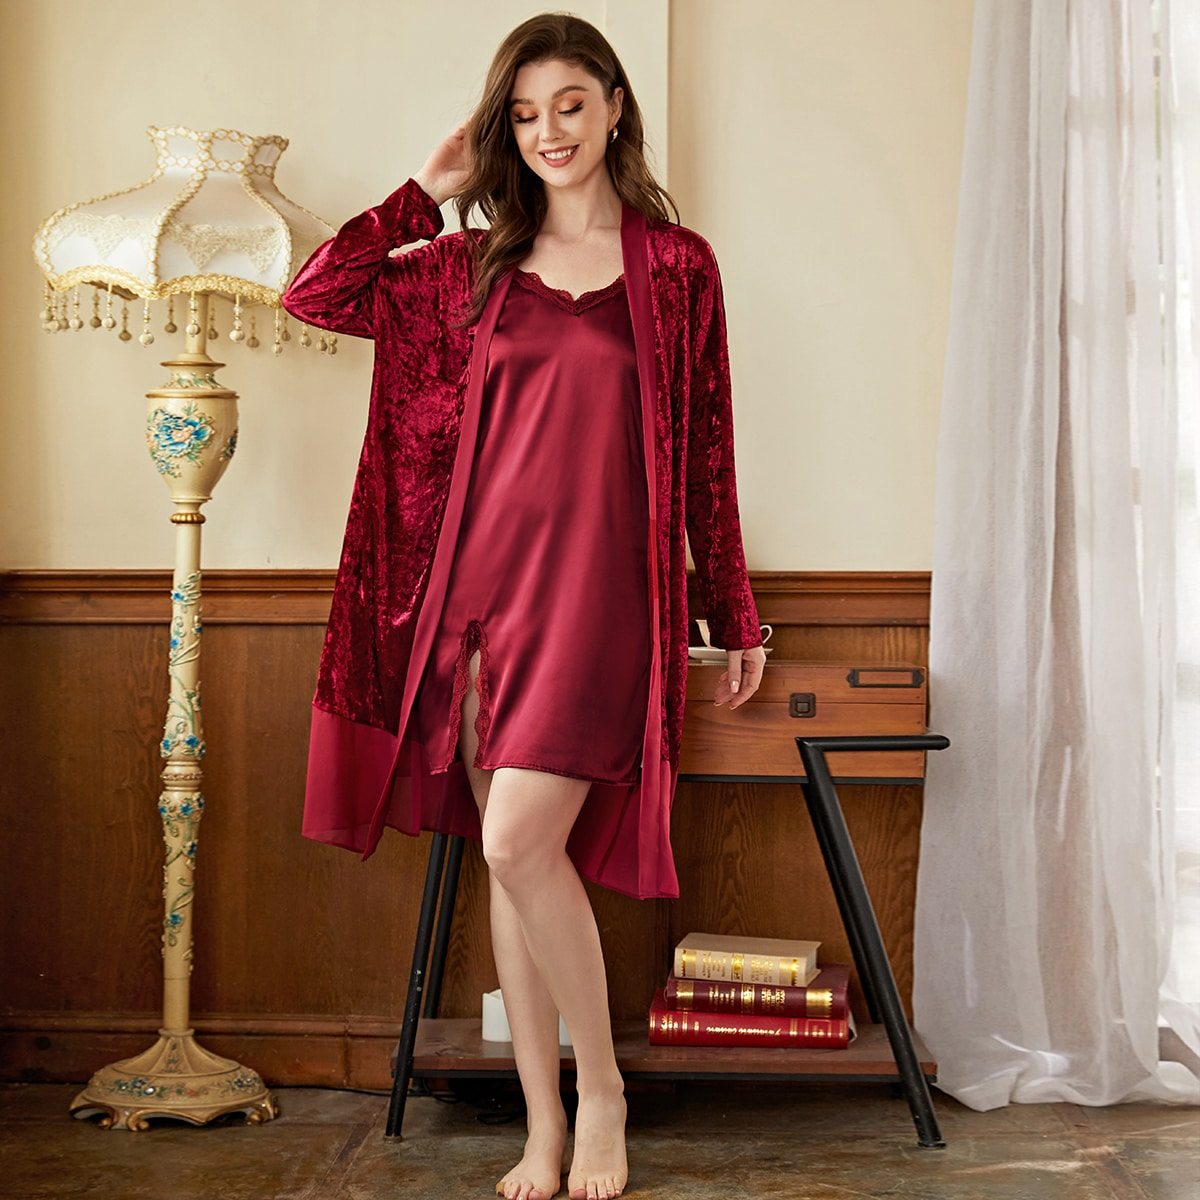 Контрастные кружева Одноцветный Элегантный Ночная пижама